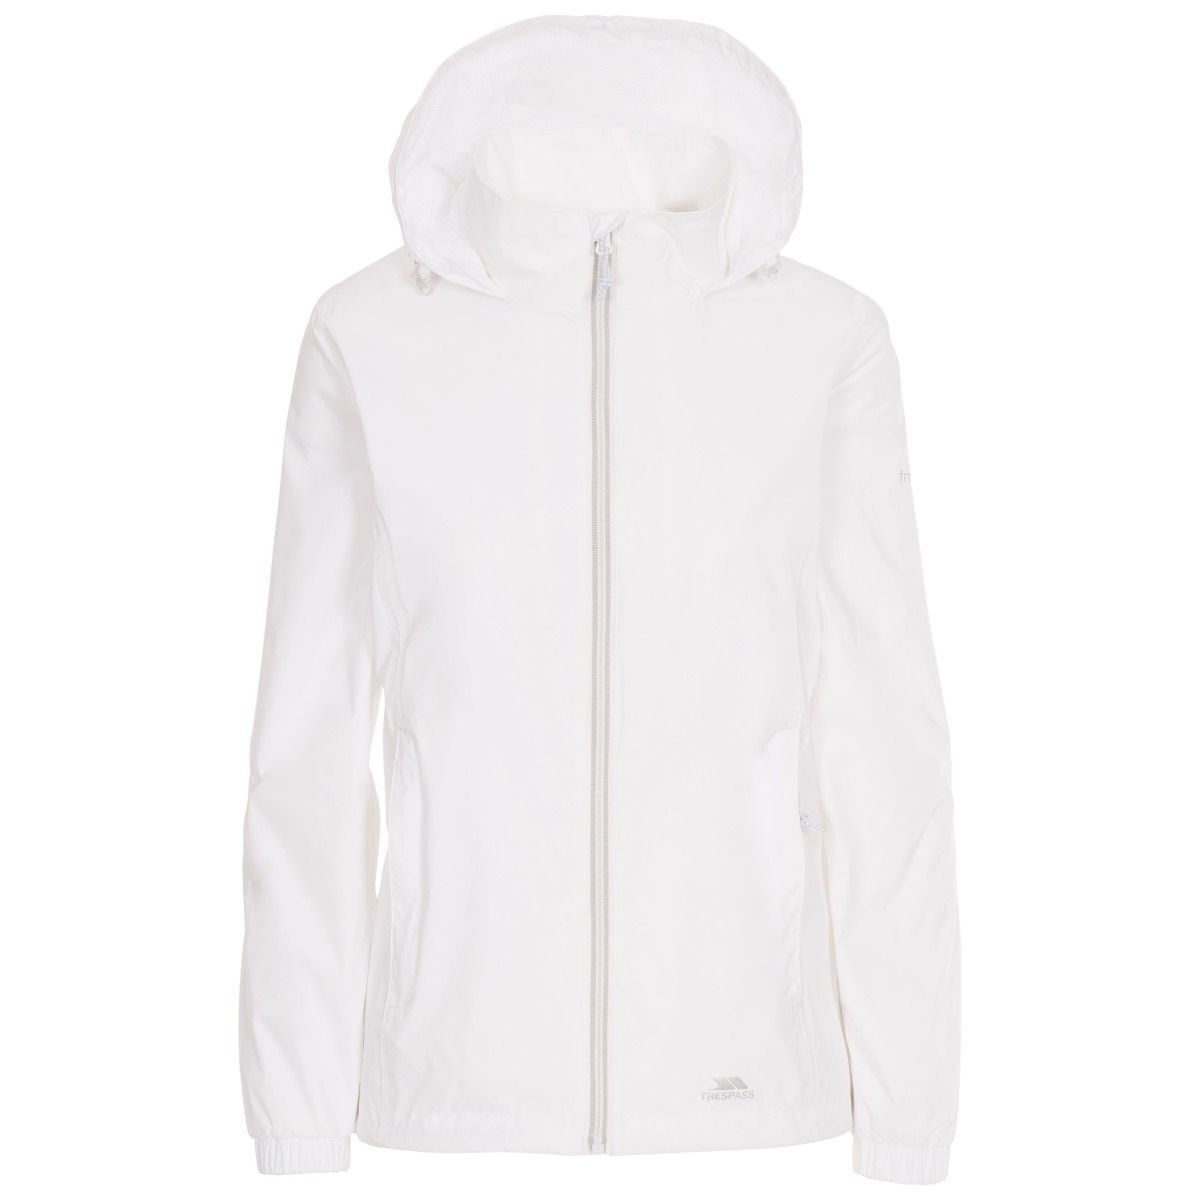 Trespass Womens/Ladies Sabrina Waterproof Jacket (3XL) (White)